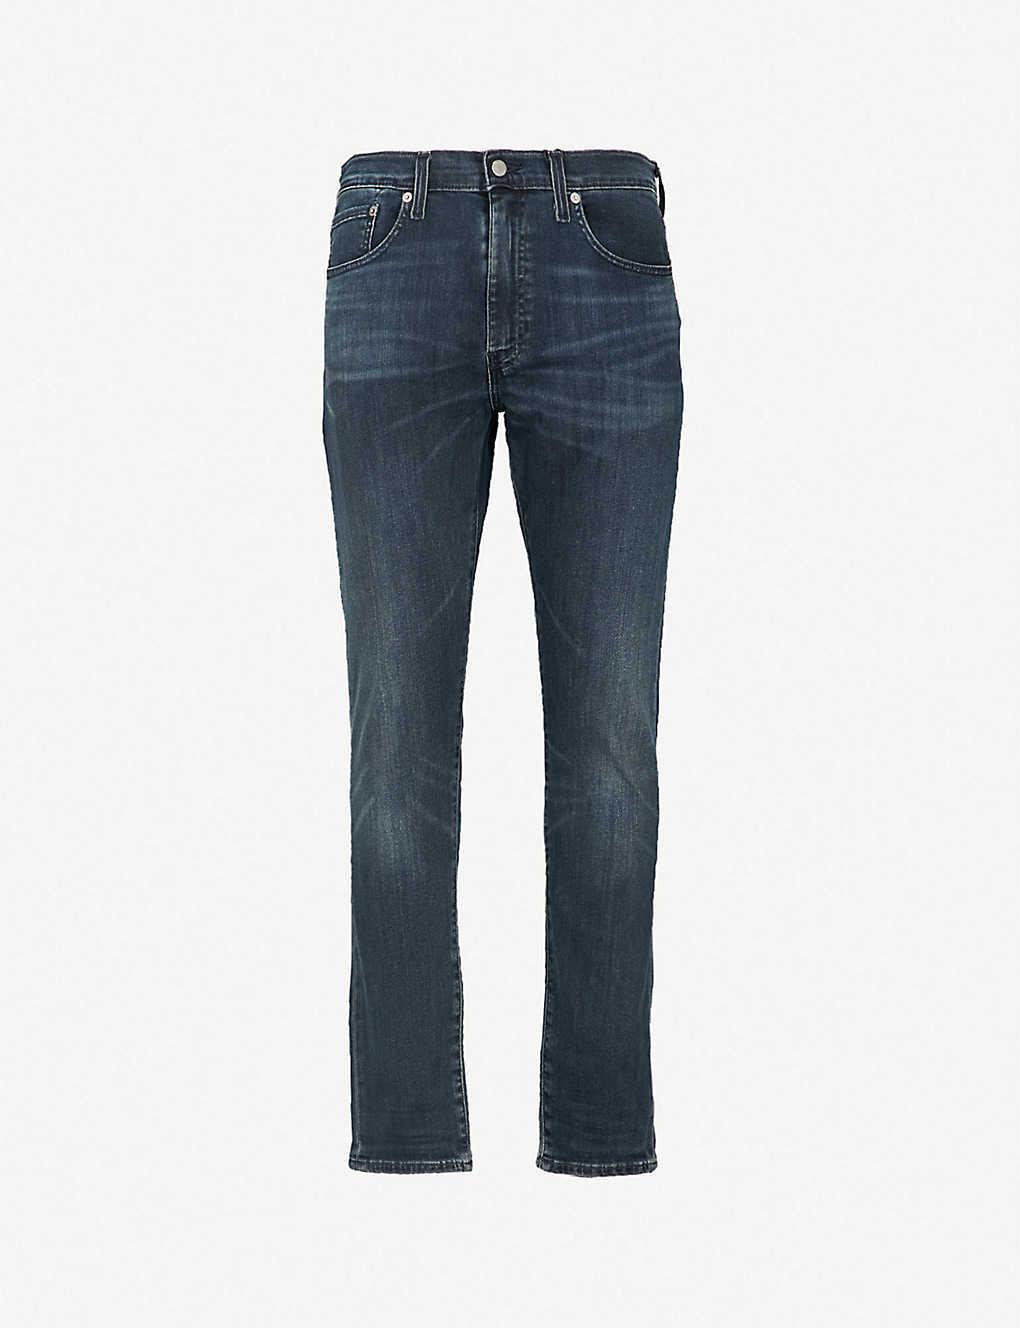 b6d2f23b23e LEVI'S - 512 slim-fit tapered jeans | Selfridges.com